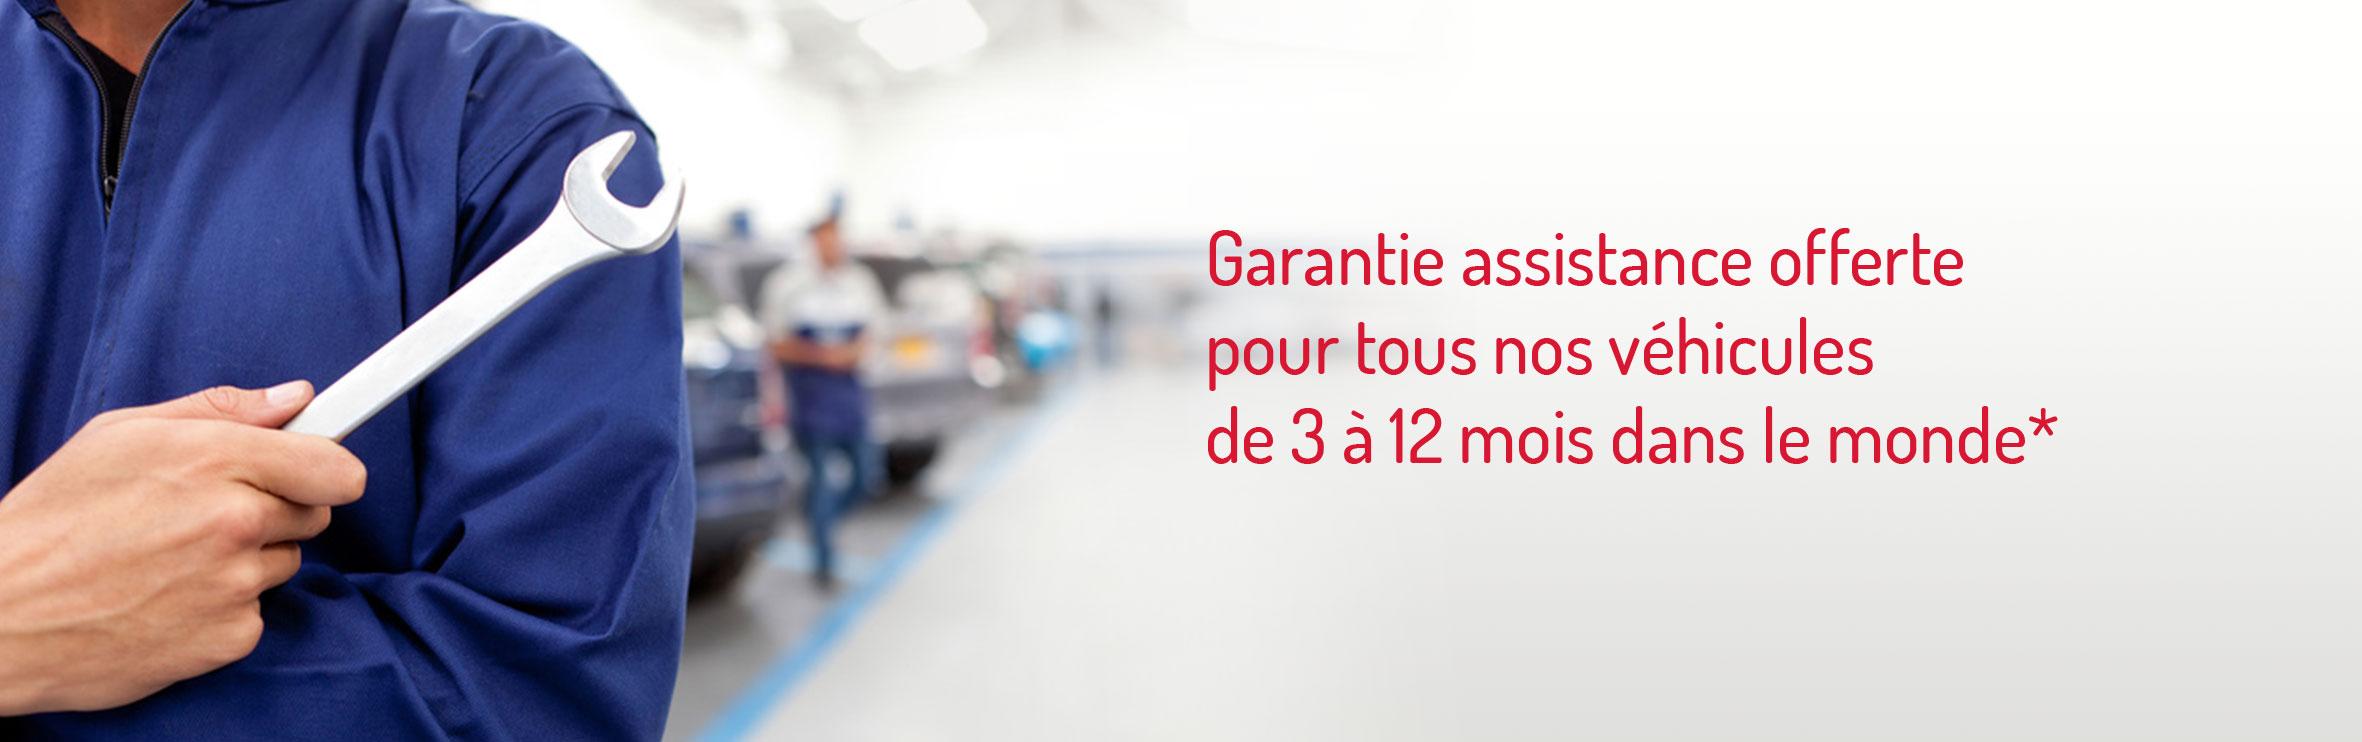 garantie assistance offerte